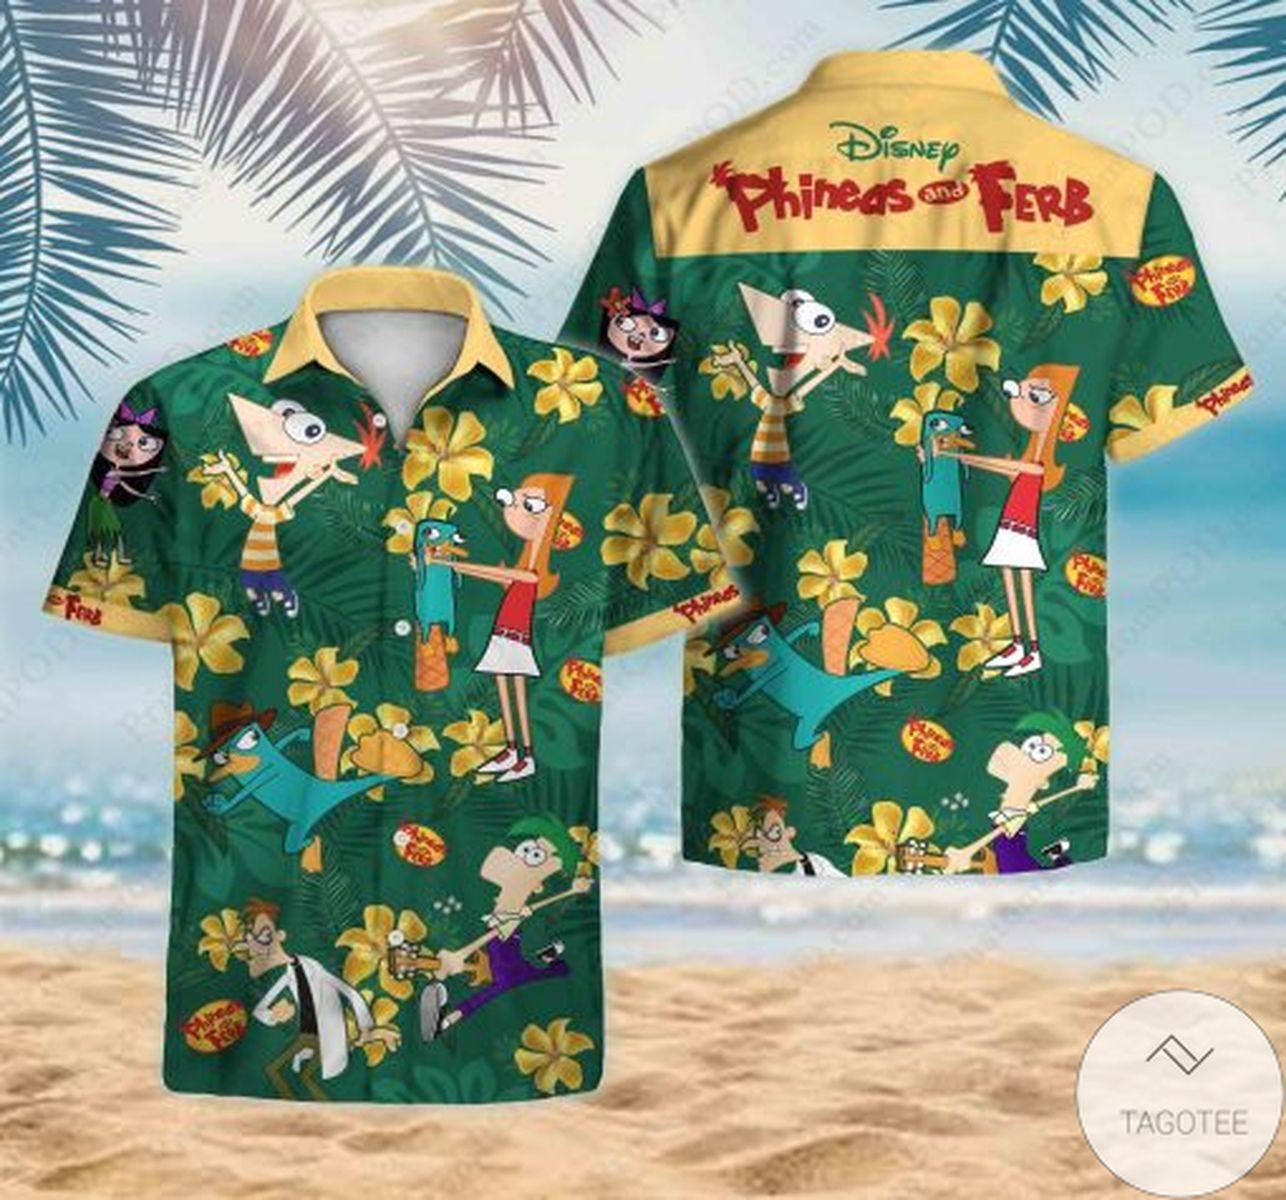 Hot Phineas And Ferb Theme Hawaiian Shirt